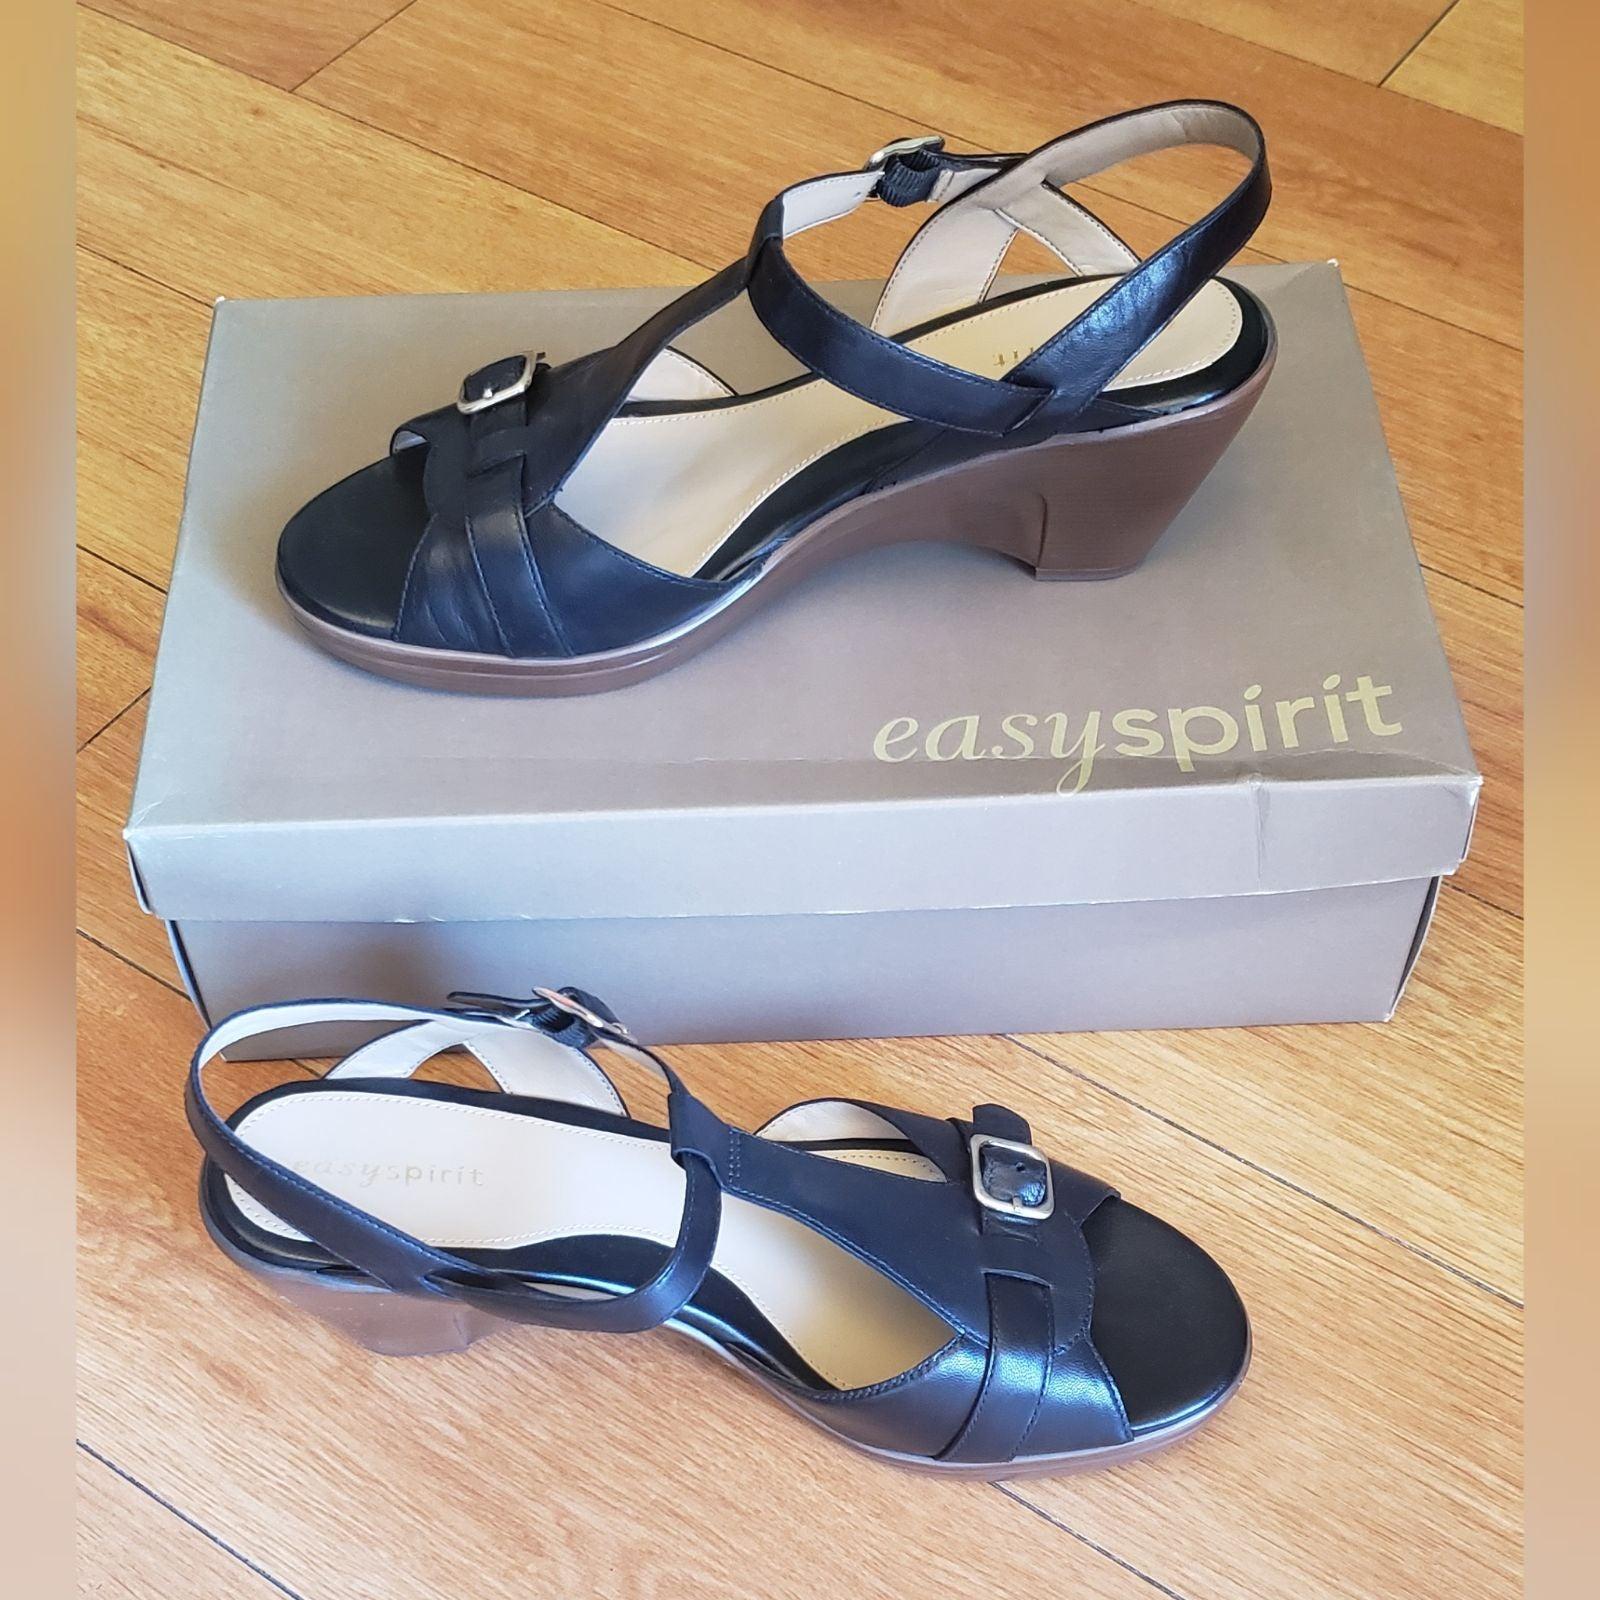 EASY SPIRIT Sandal Wooden Wedge Heel